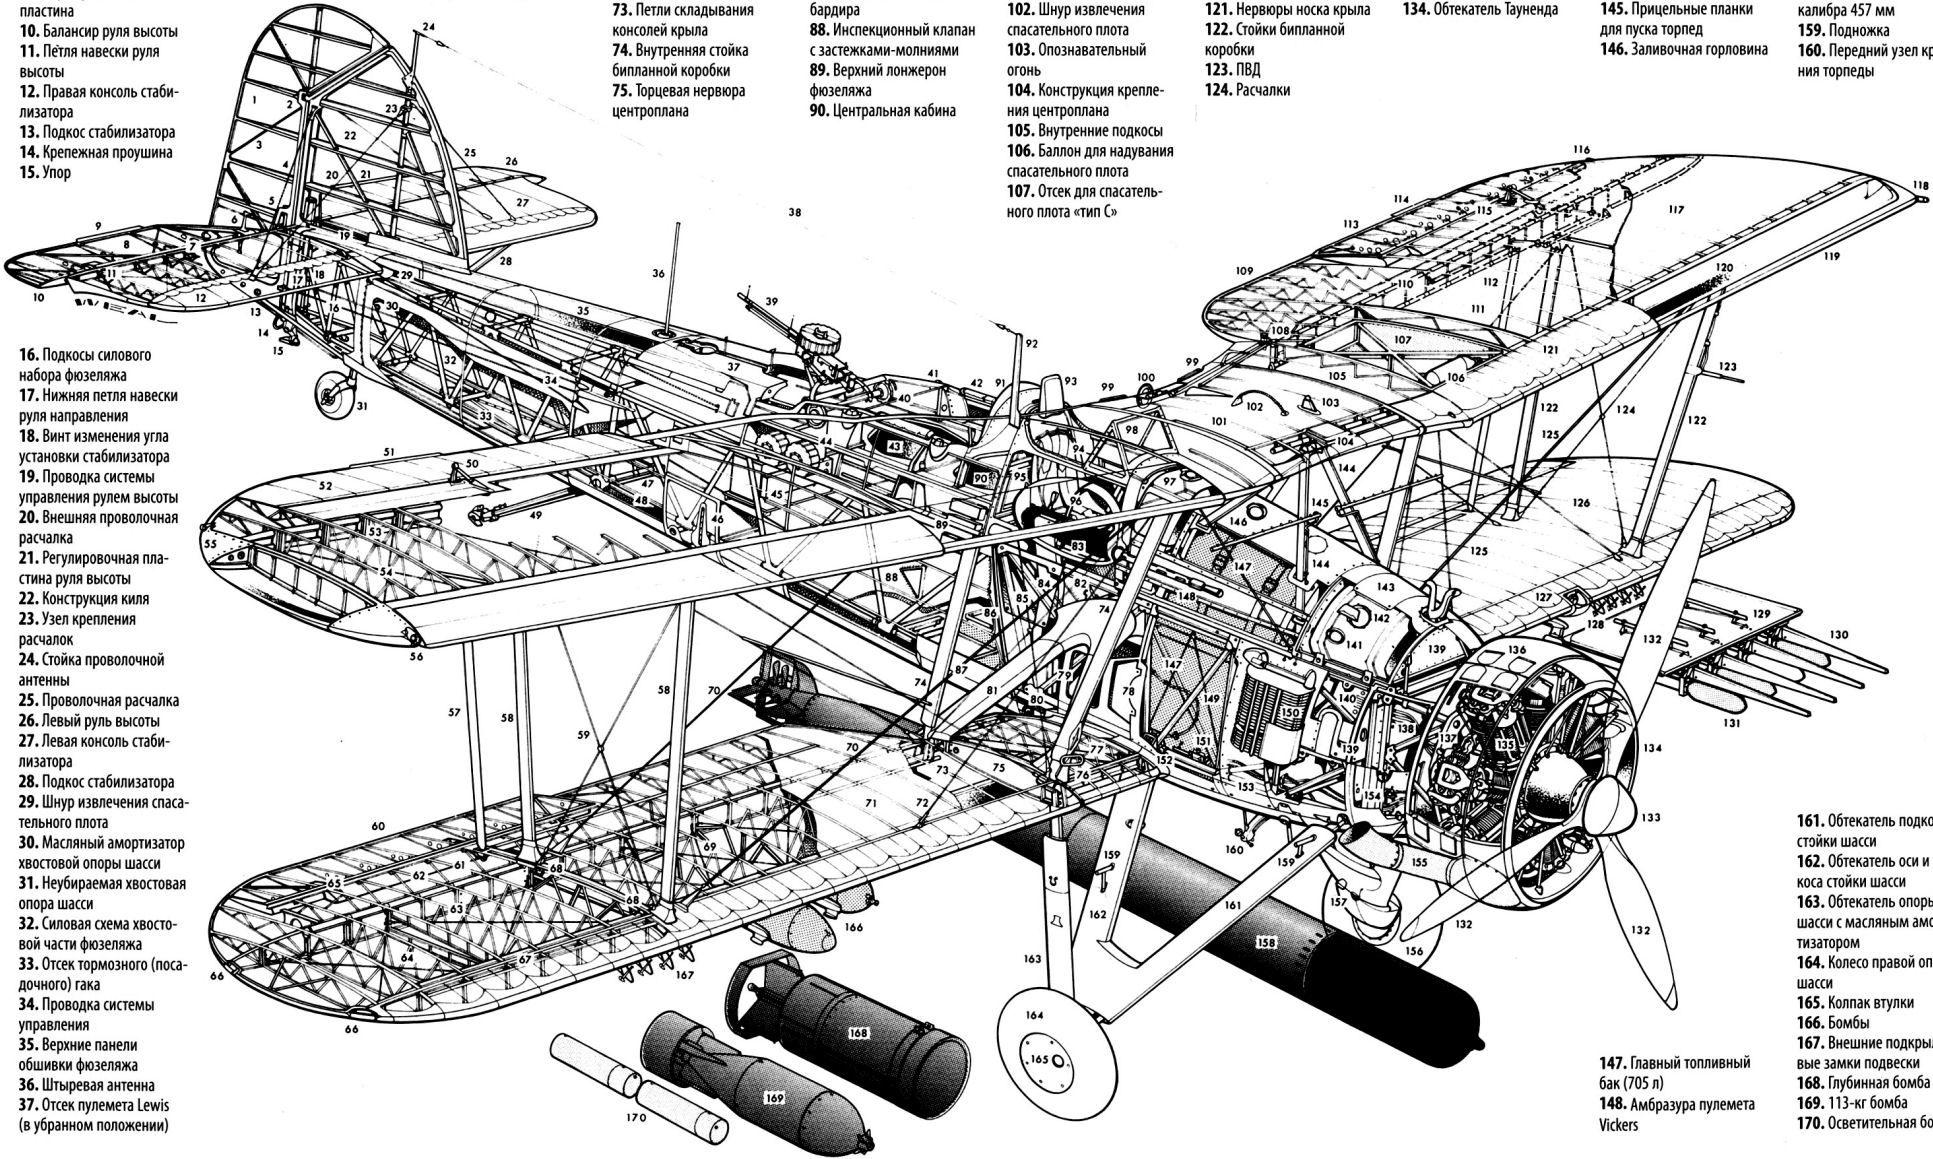 1936 45 fairey swordfish royal navy torpedo bomber engine bristol pegasus iiim 3 radial